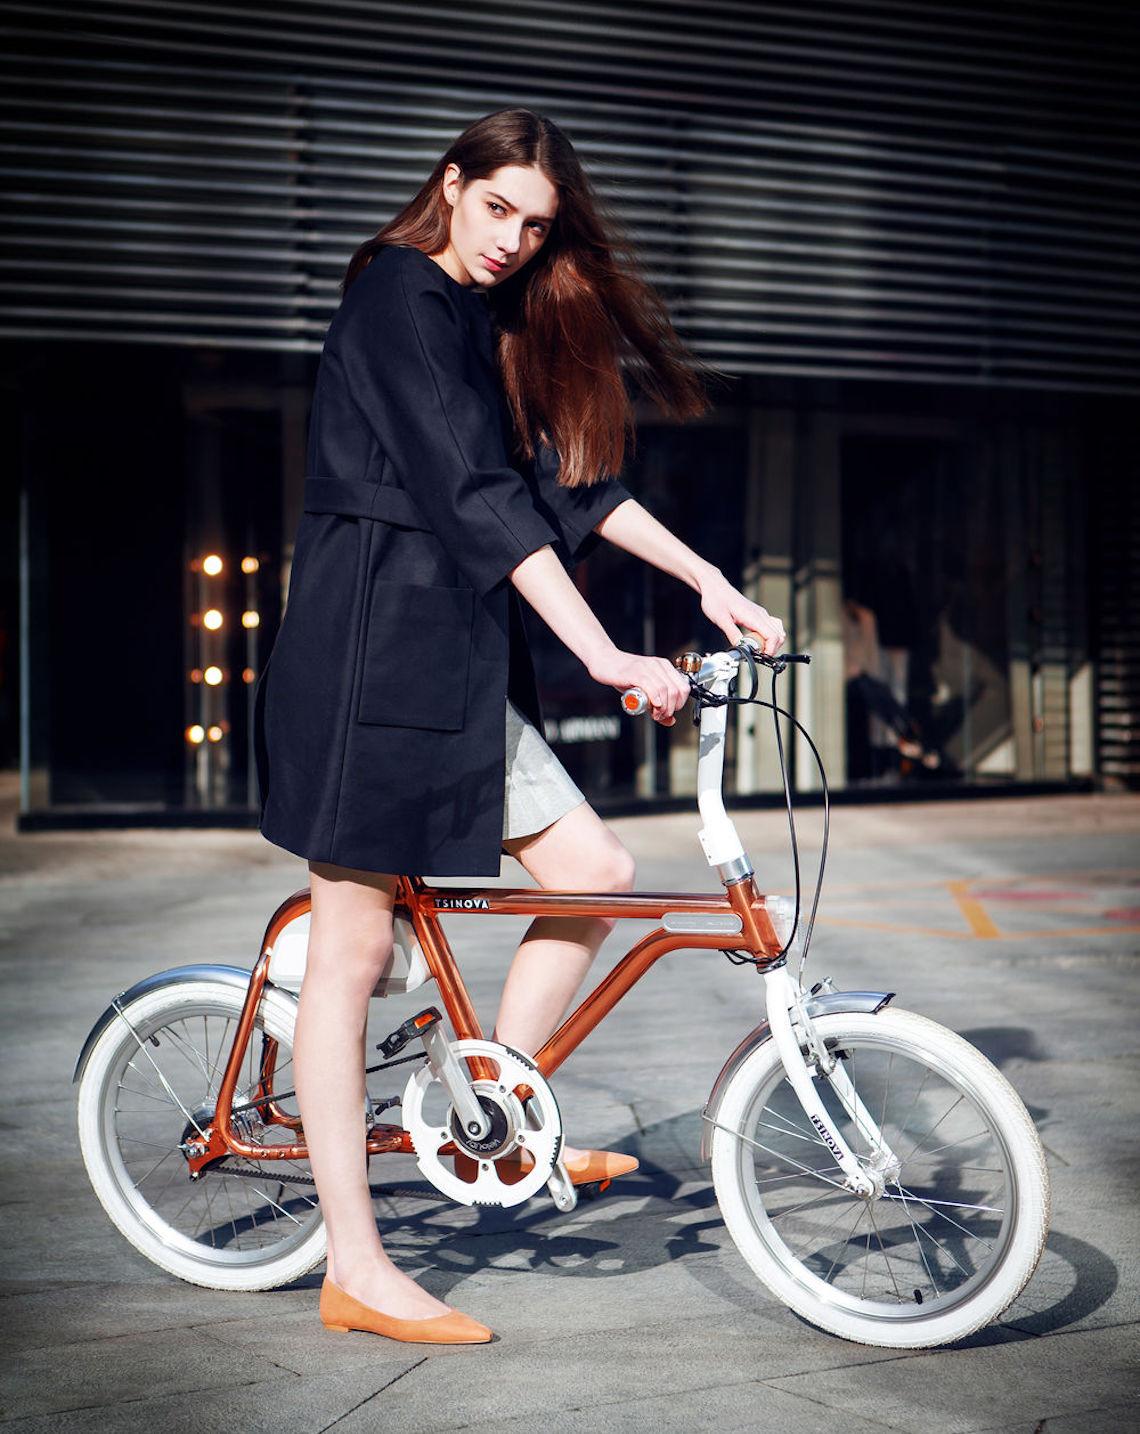 Tsinova ION smart-e-bike_urbancycling_7